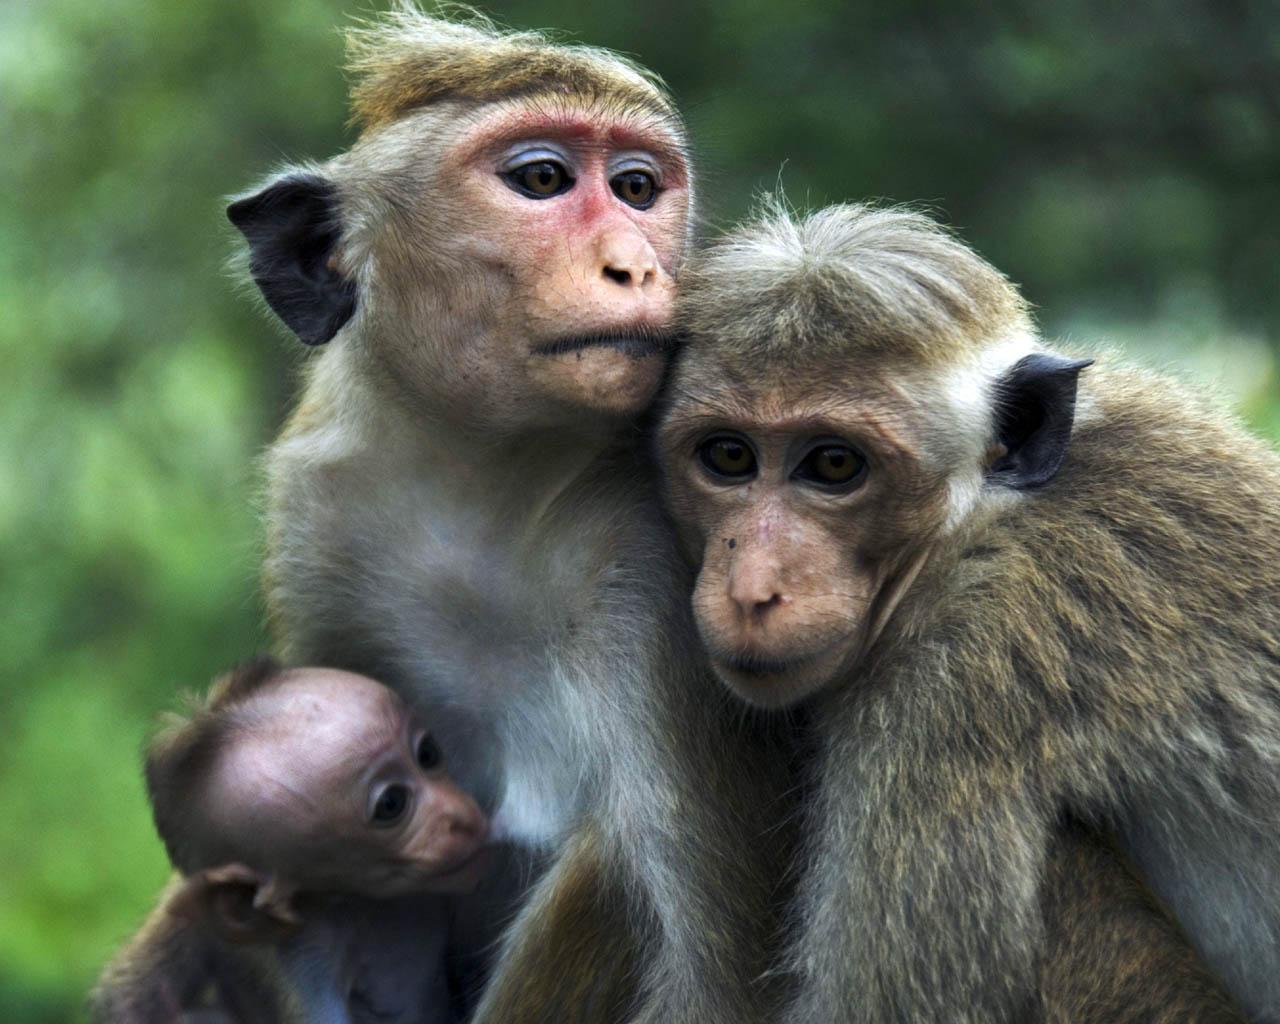 Evolution of color vision in primates